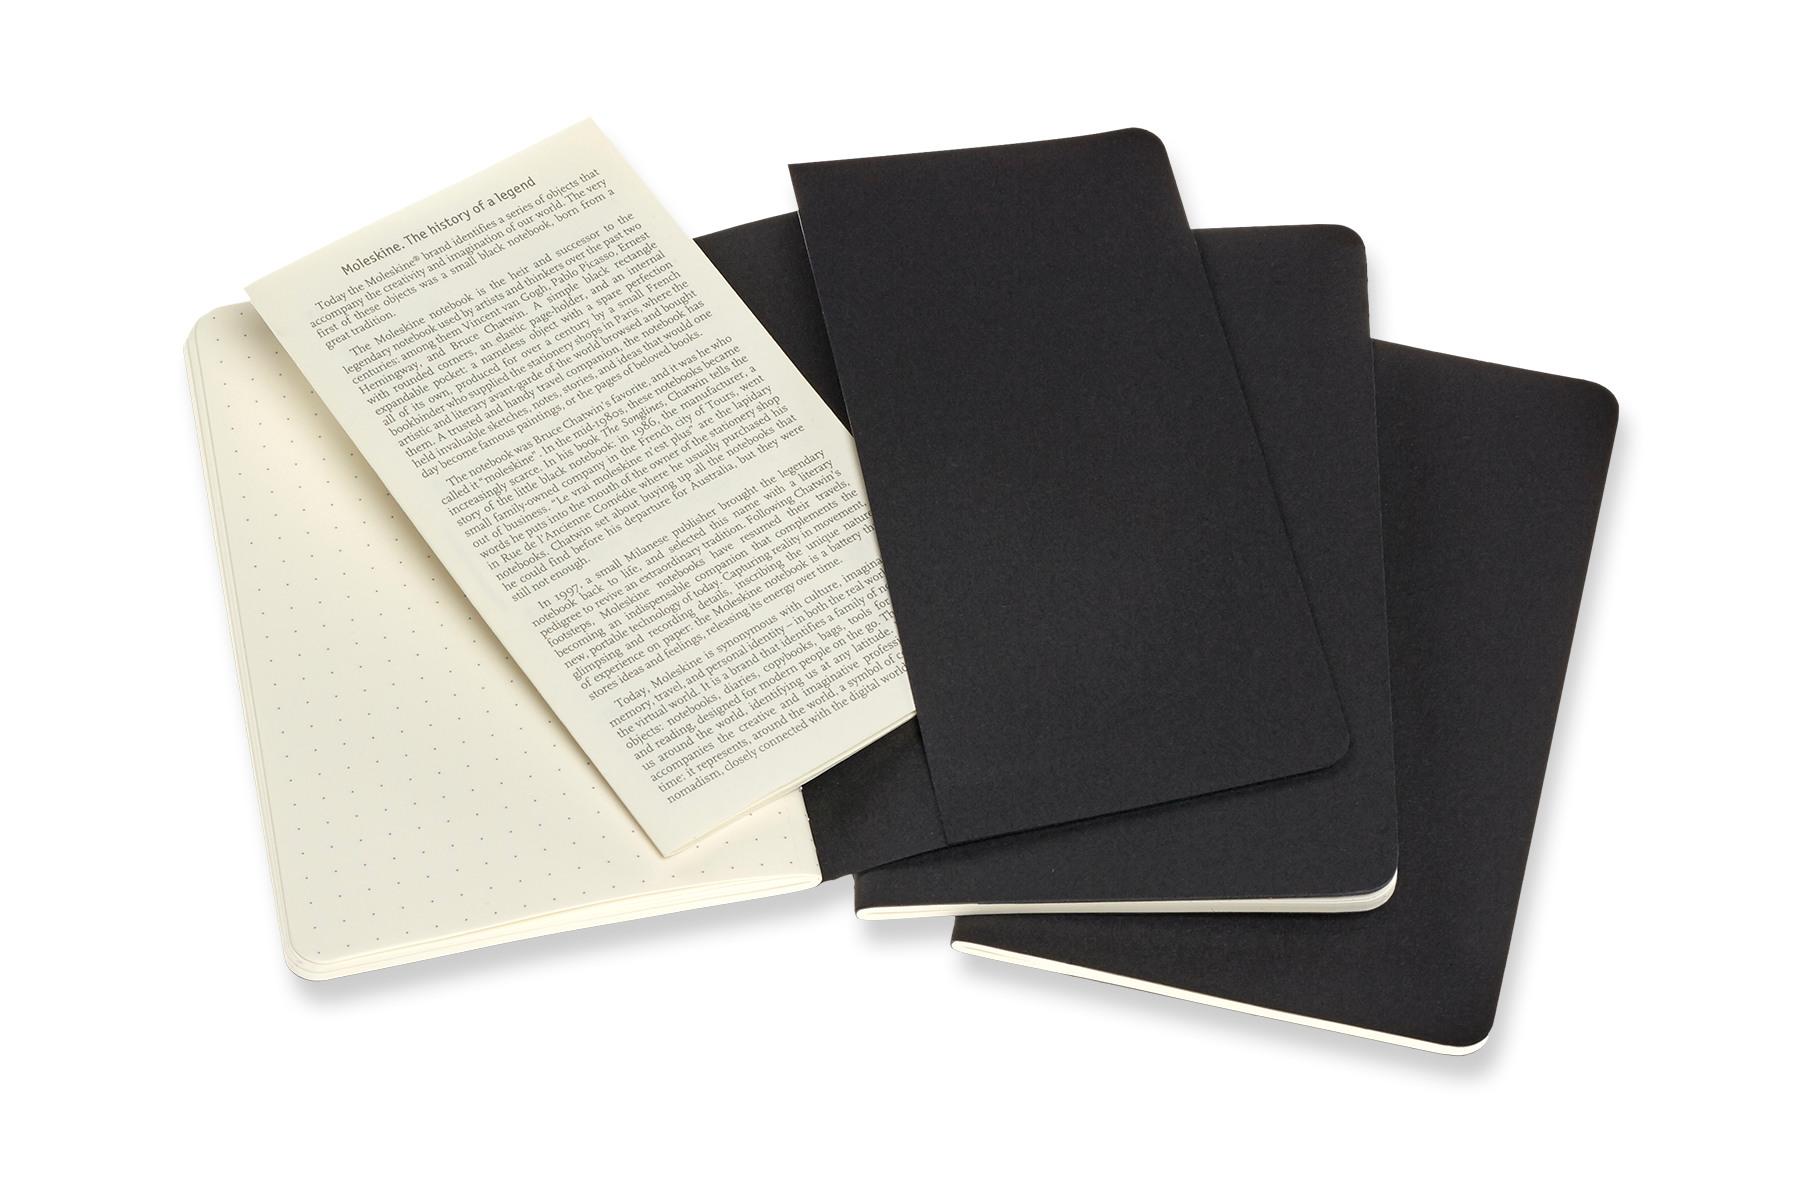 Moleskine Cahier P/A6, 3x Set, Dotted, Carton Cover, Black